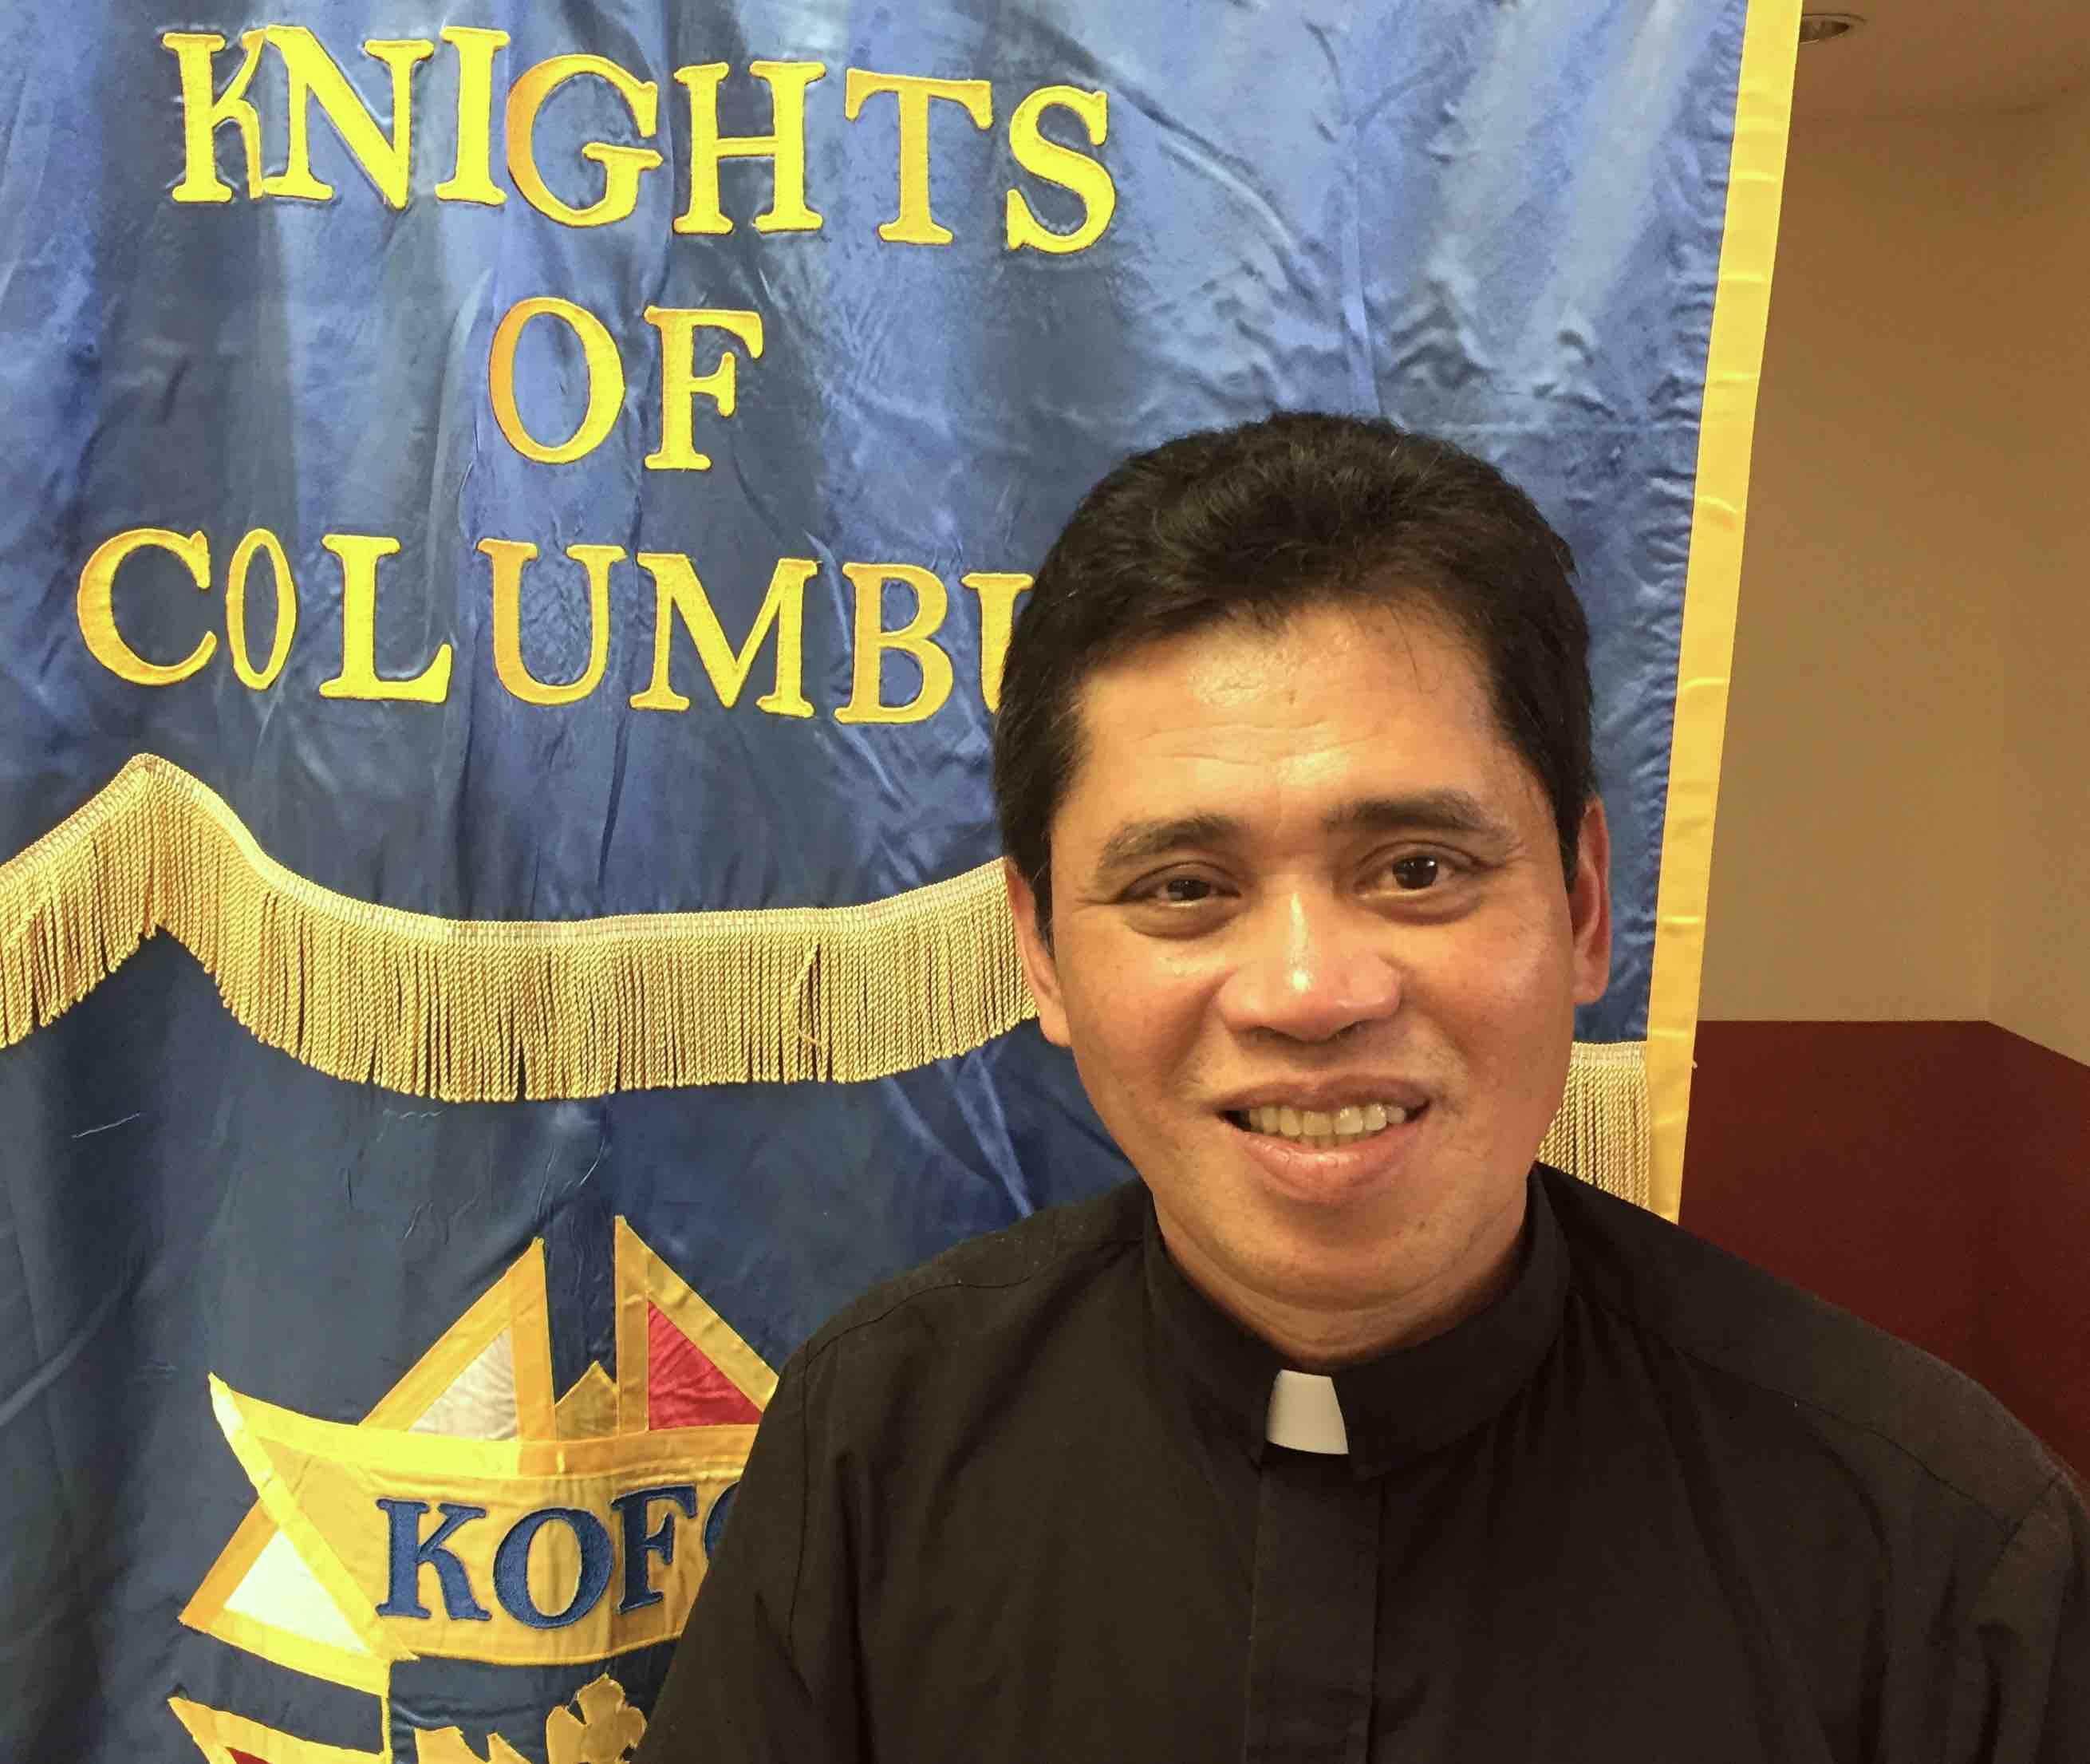 Chaplain Fr. Zamora